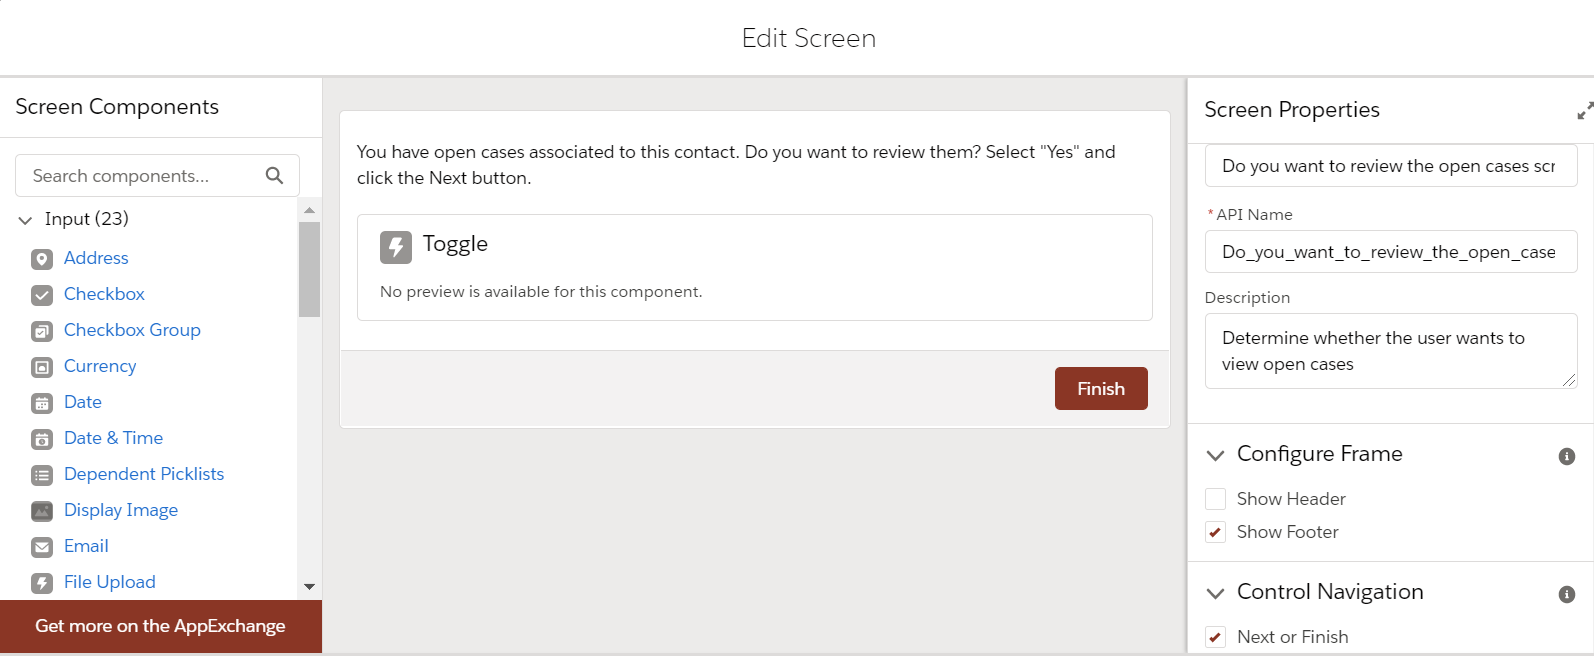 ViewAndEditOpenCaseFlow-Screen1-Properties.PNG